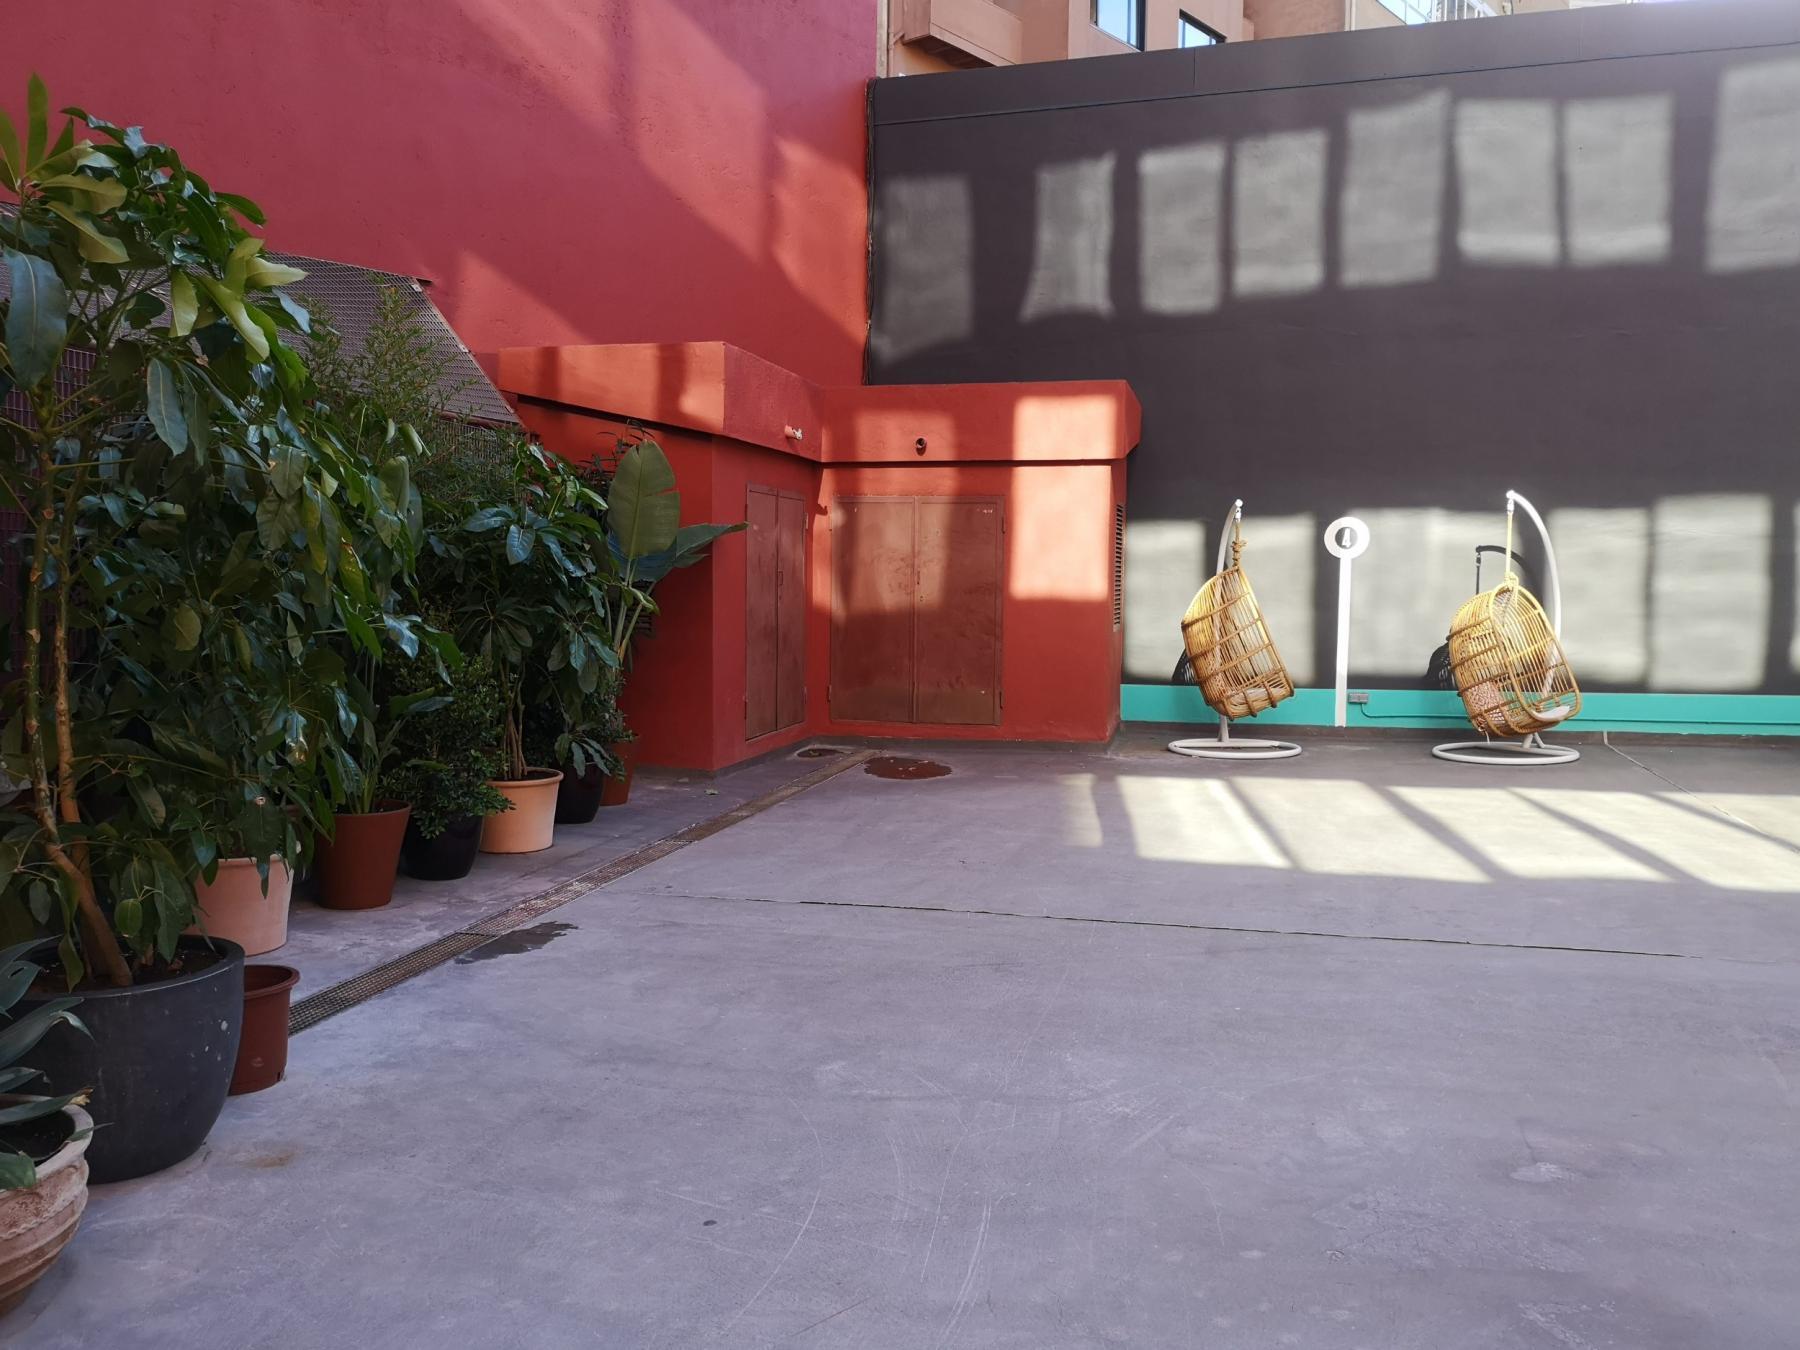 Alquilar oficinas Riera de Sant Miquel 1, Barcelona (7)